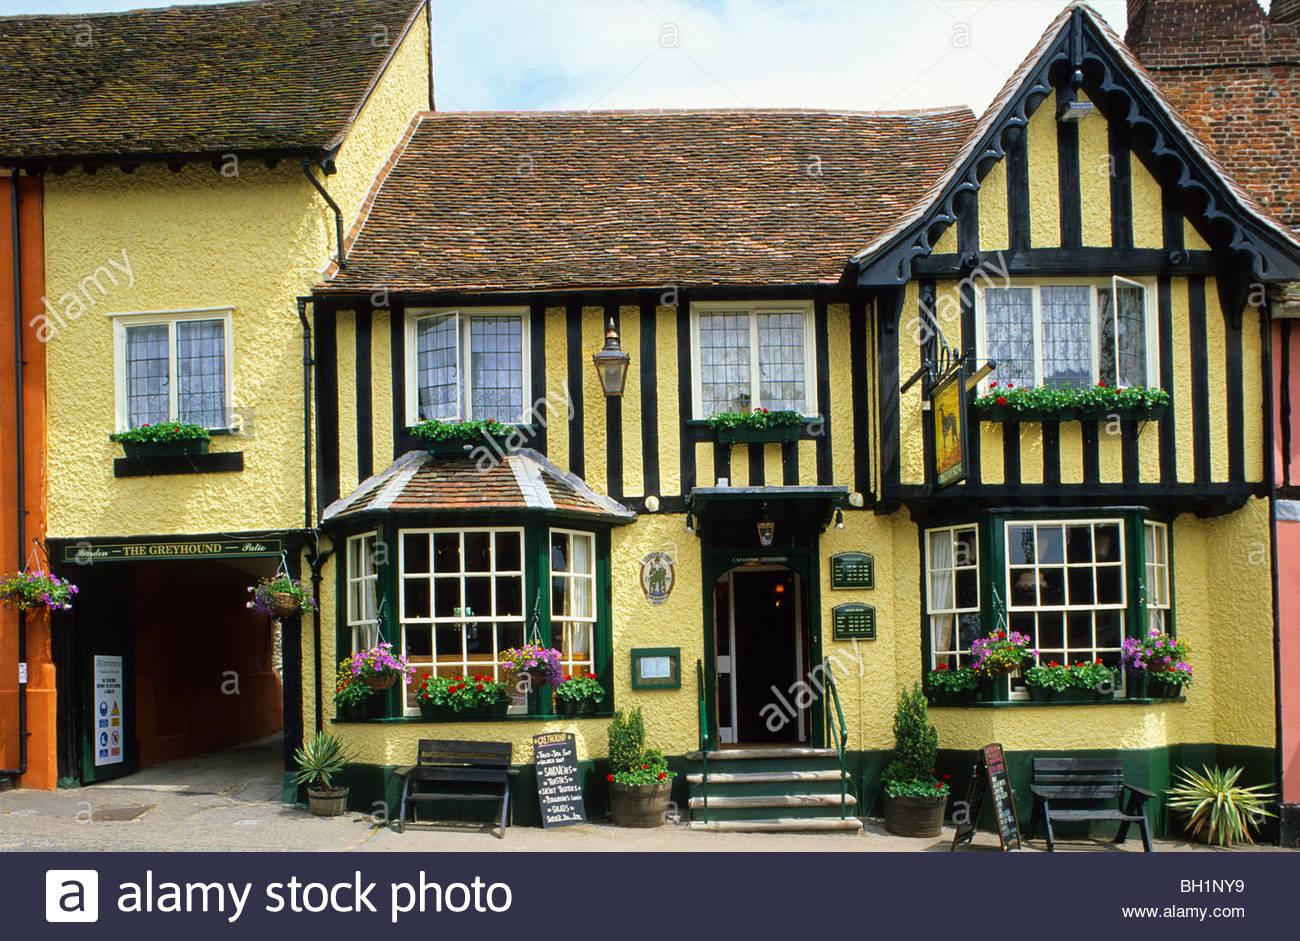 Europe, England, Suffolk, Lavenham, East Anglia, Pub The Greyhound - Stock Image